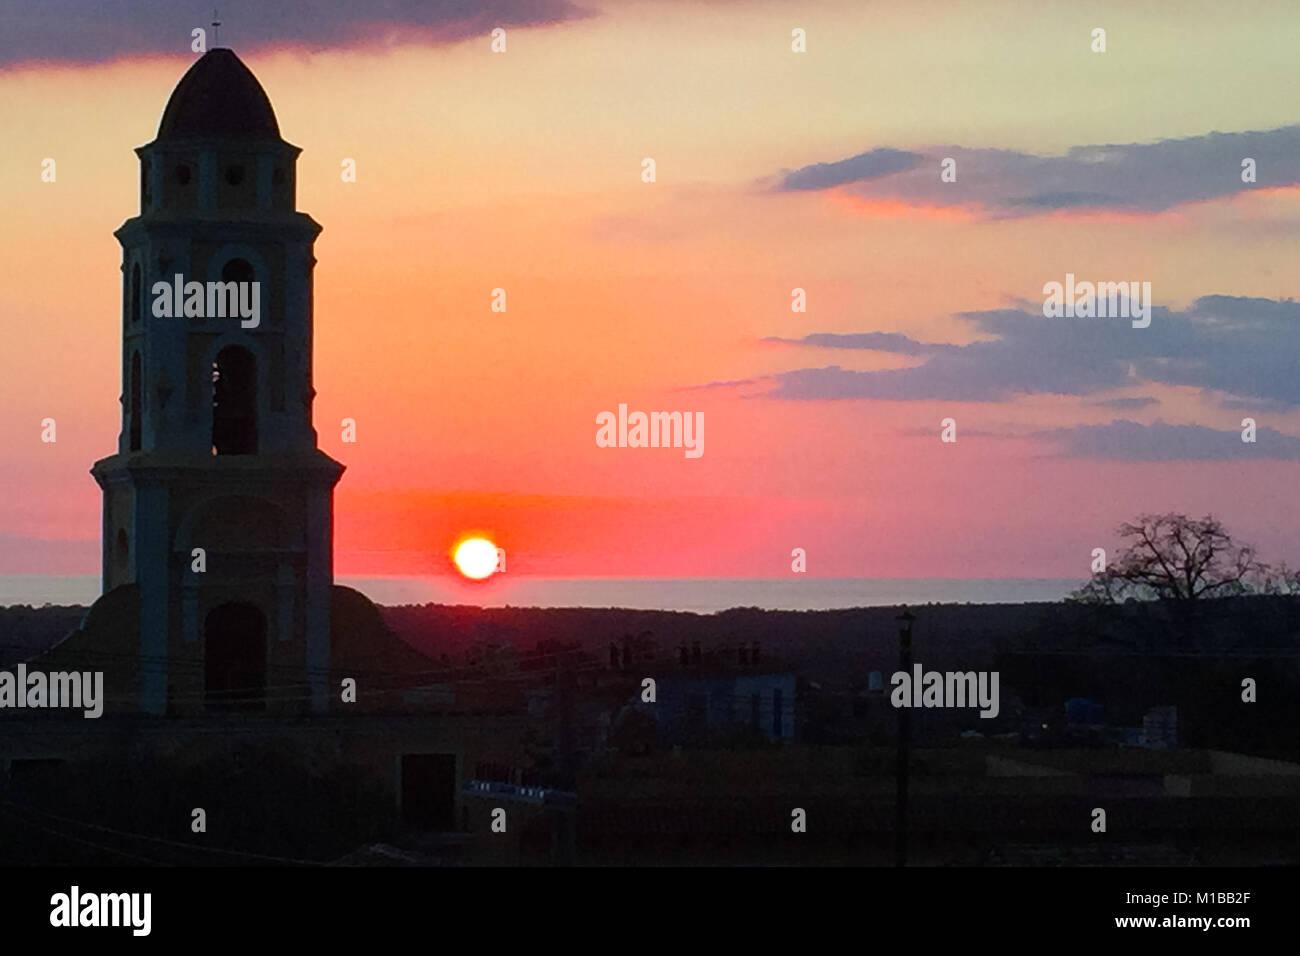 Church silhouette - Stock Image